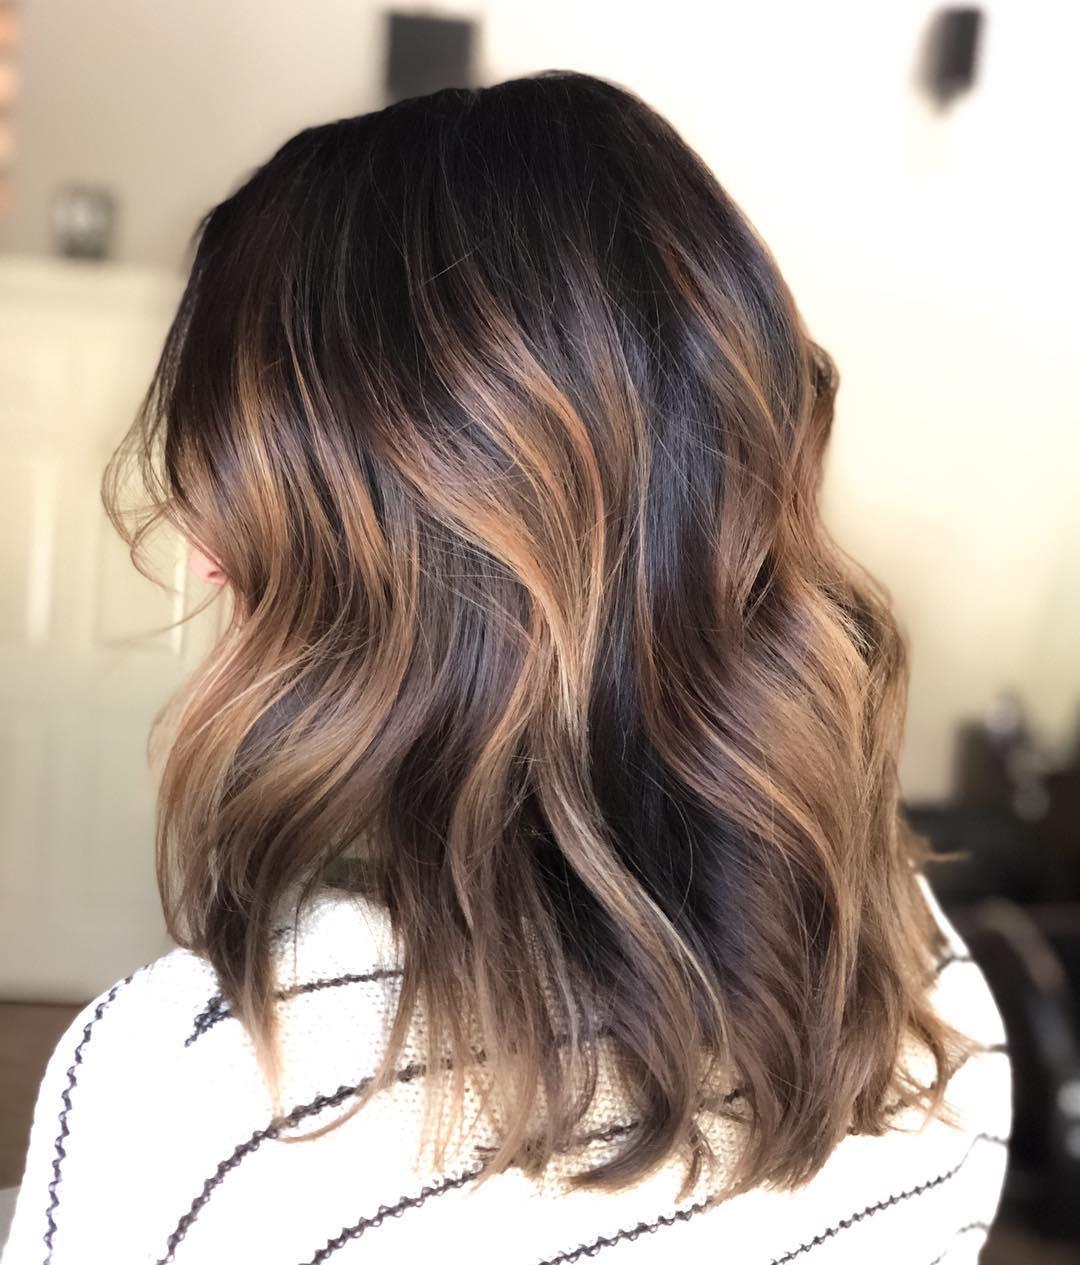 Окрашивание волос зима 2019-2020 фото 13